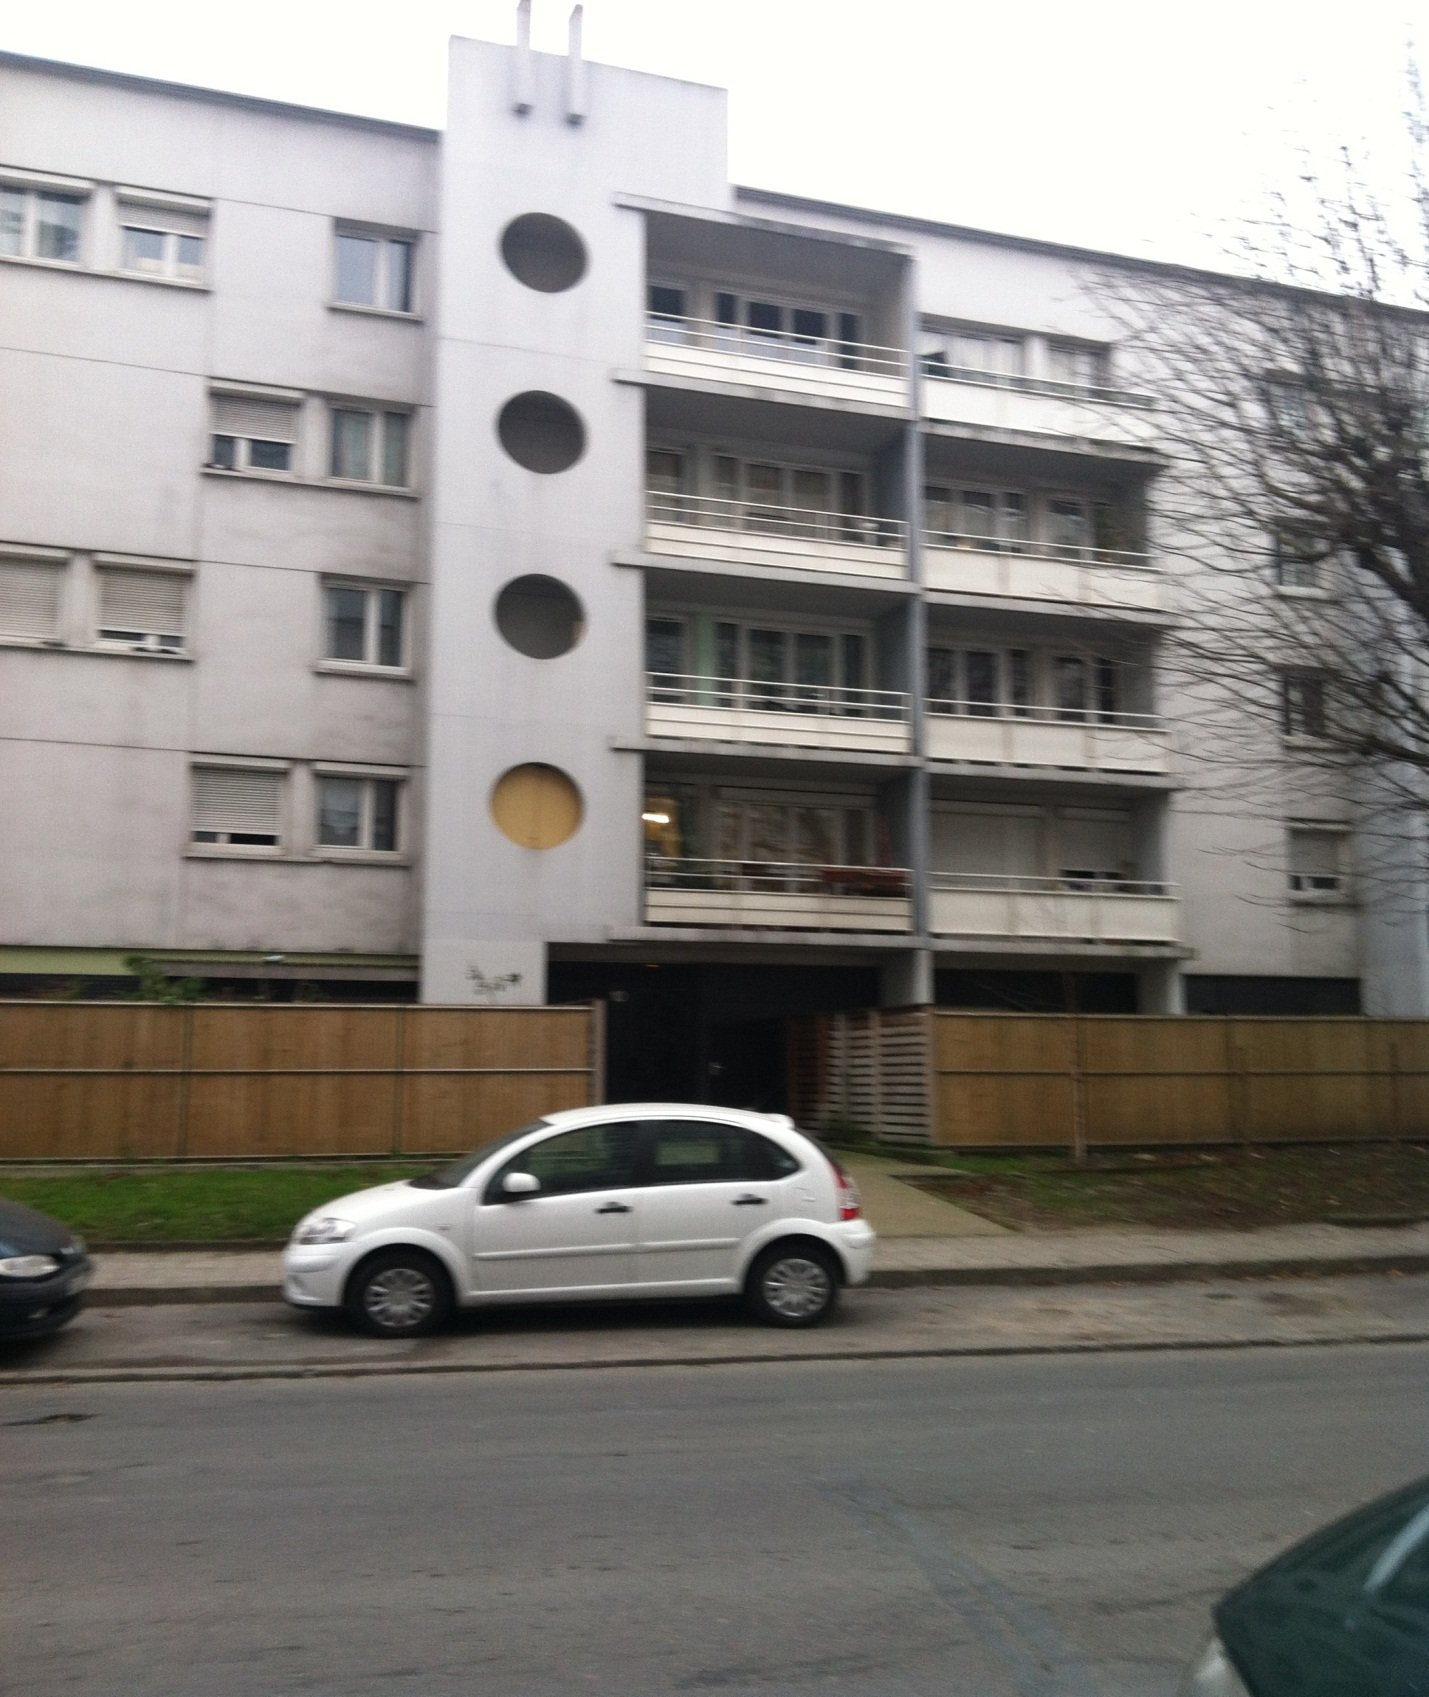 Paris Social Housing